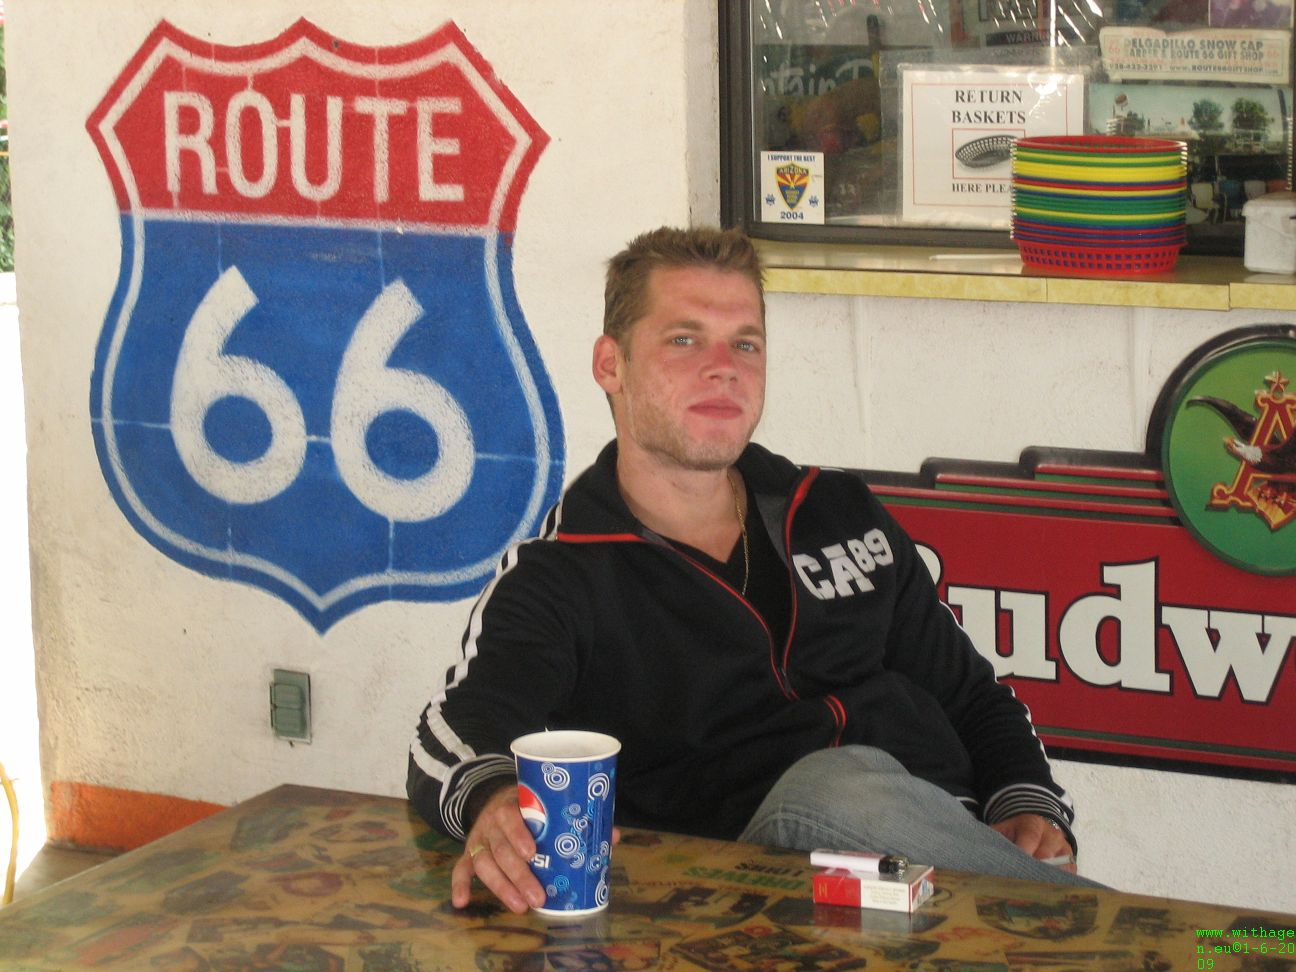 Jeroen at Snowcap drive in Seligman route 66